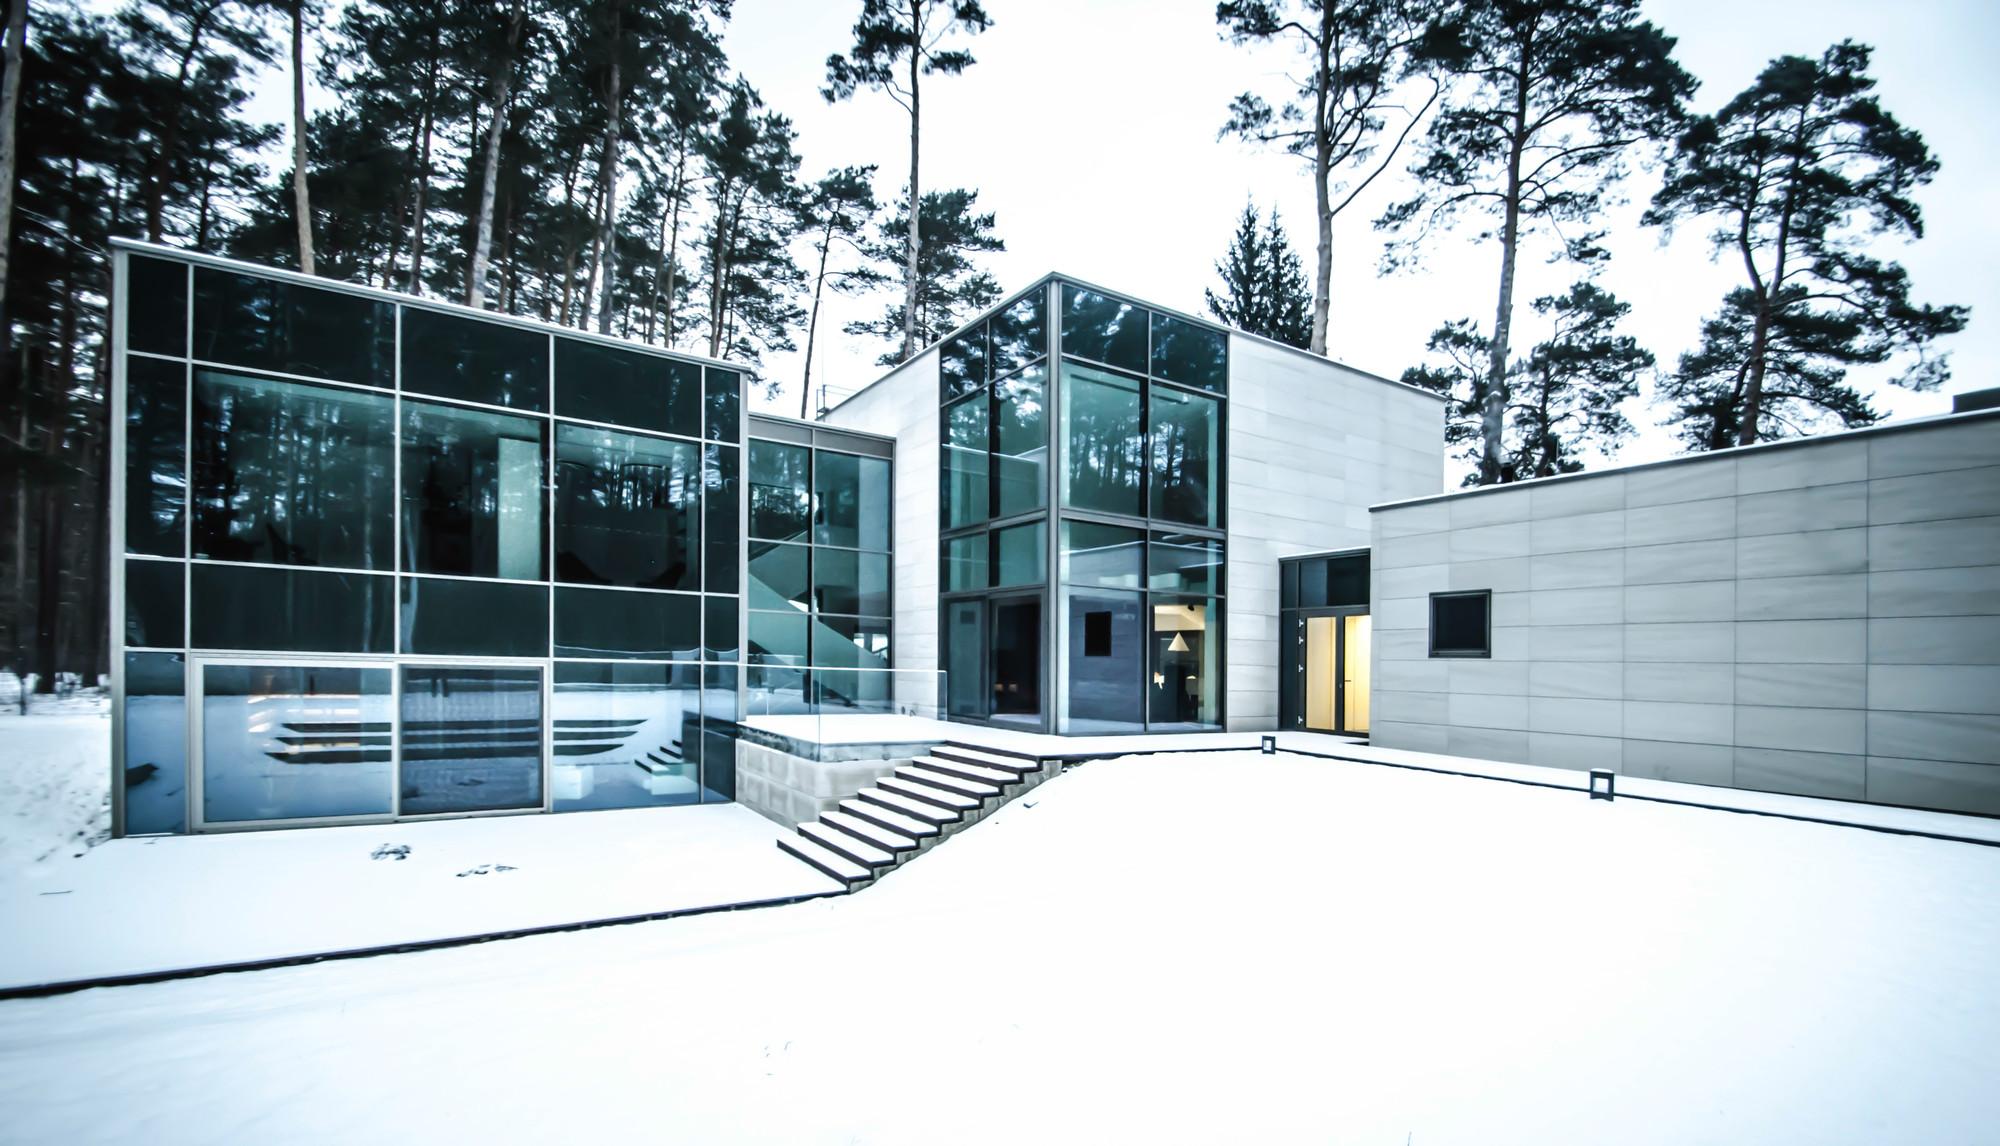 Parallelepiped Rectangle House / Devyni Architektai,  Arunas Skrolis